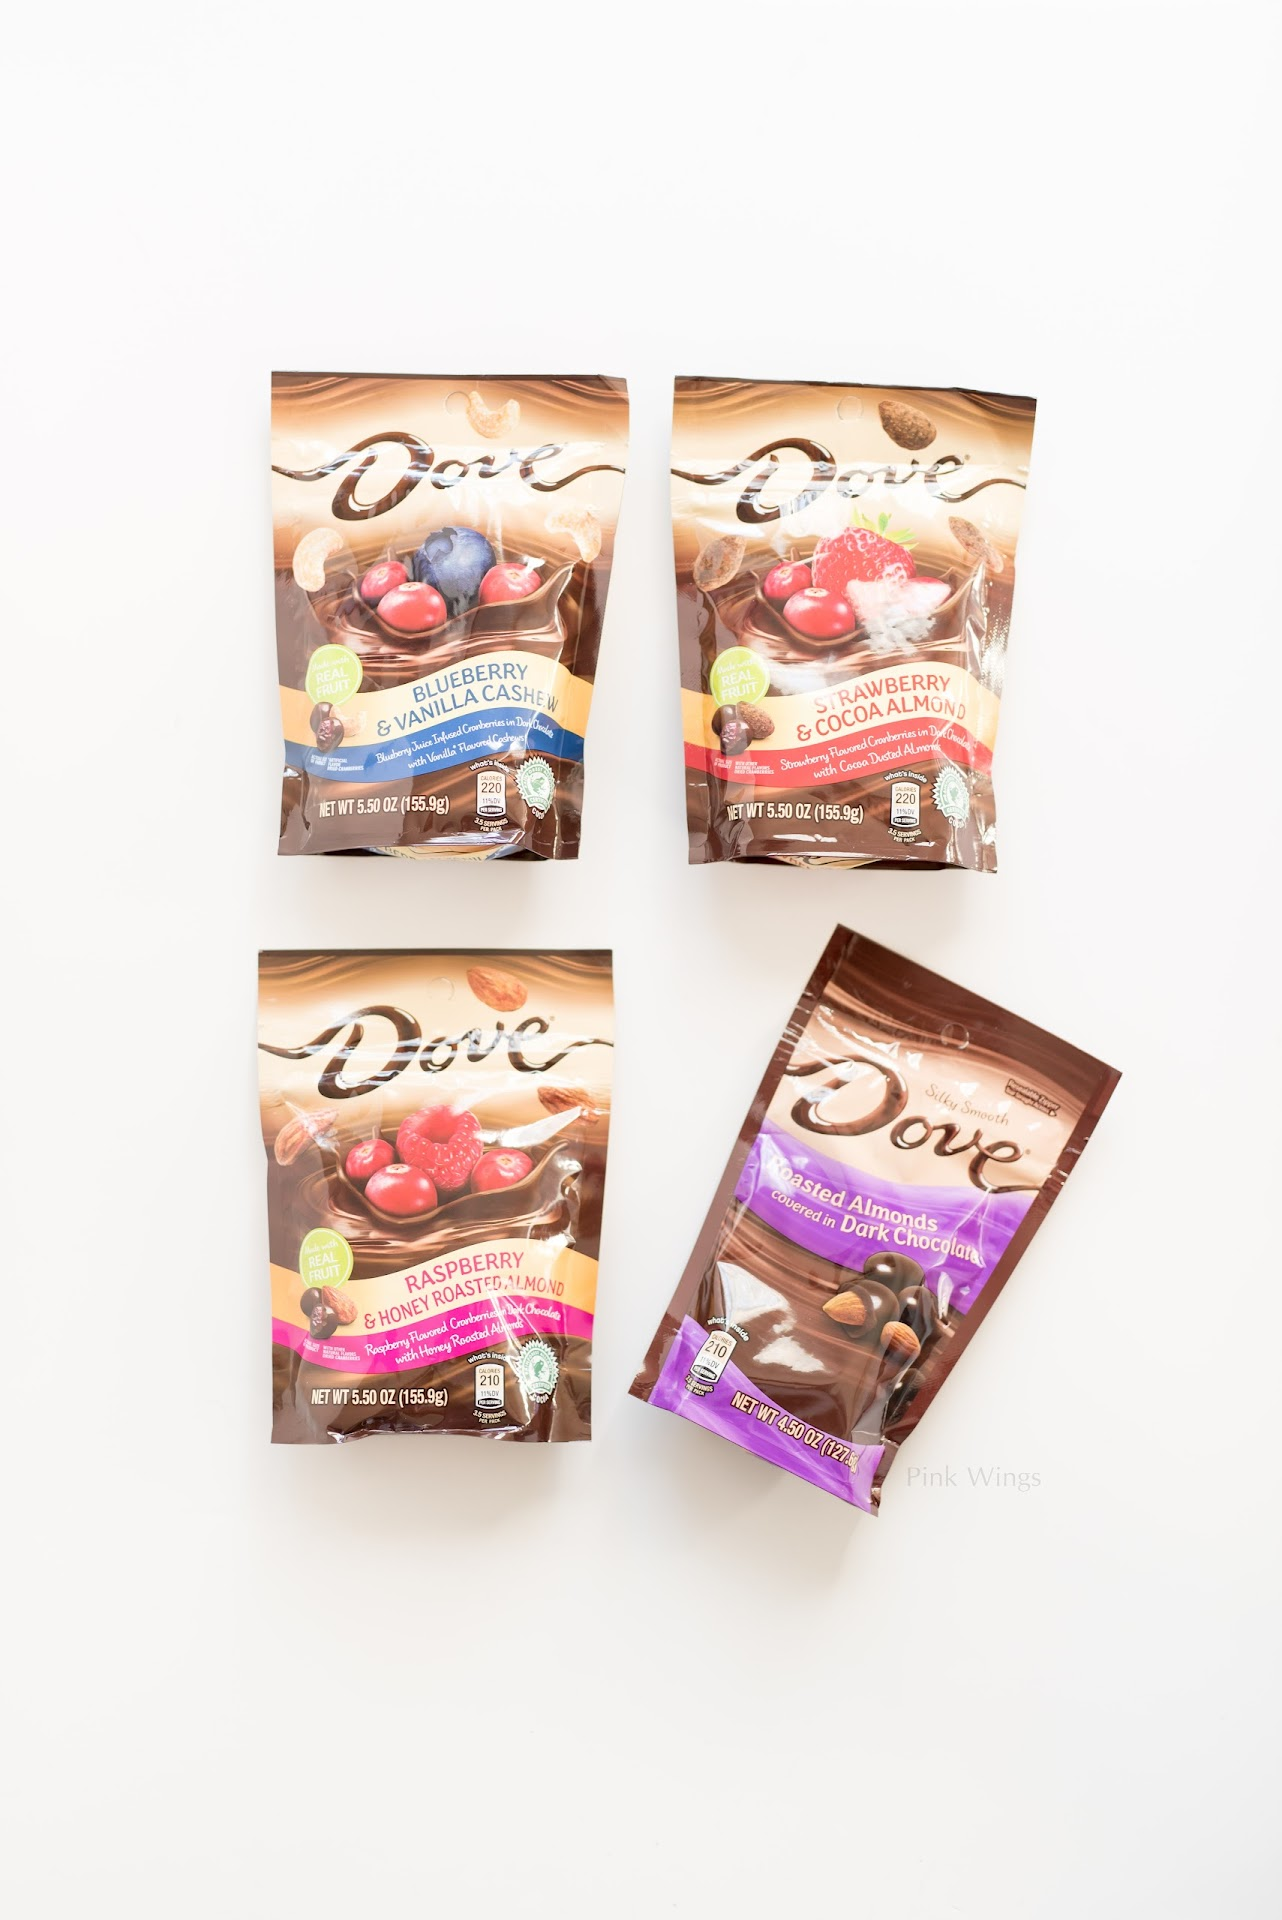 best dark chocolate, best dark chocolate brands, best dark chocolate for health, best dark chocolate 2015, 2016